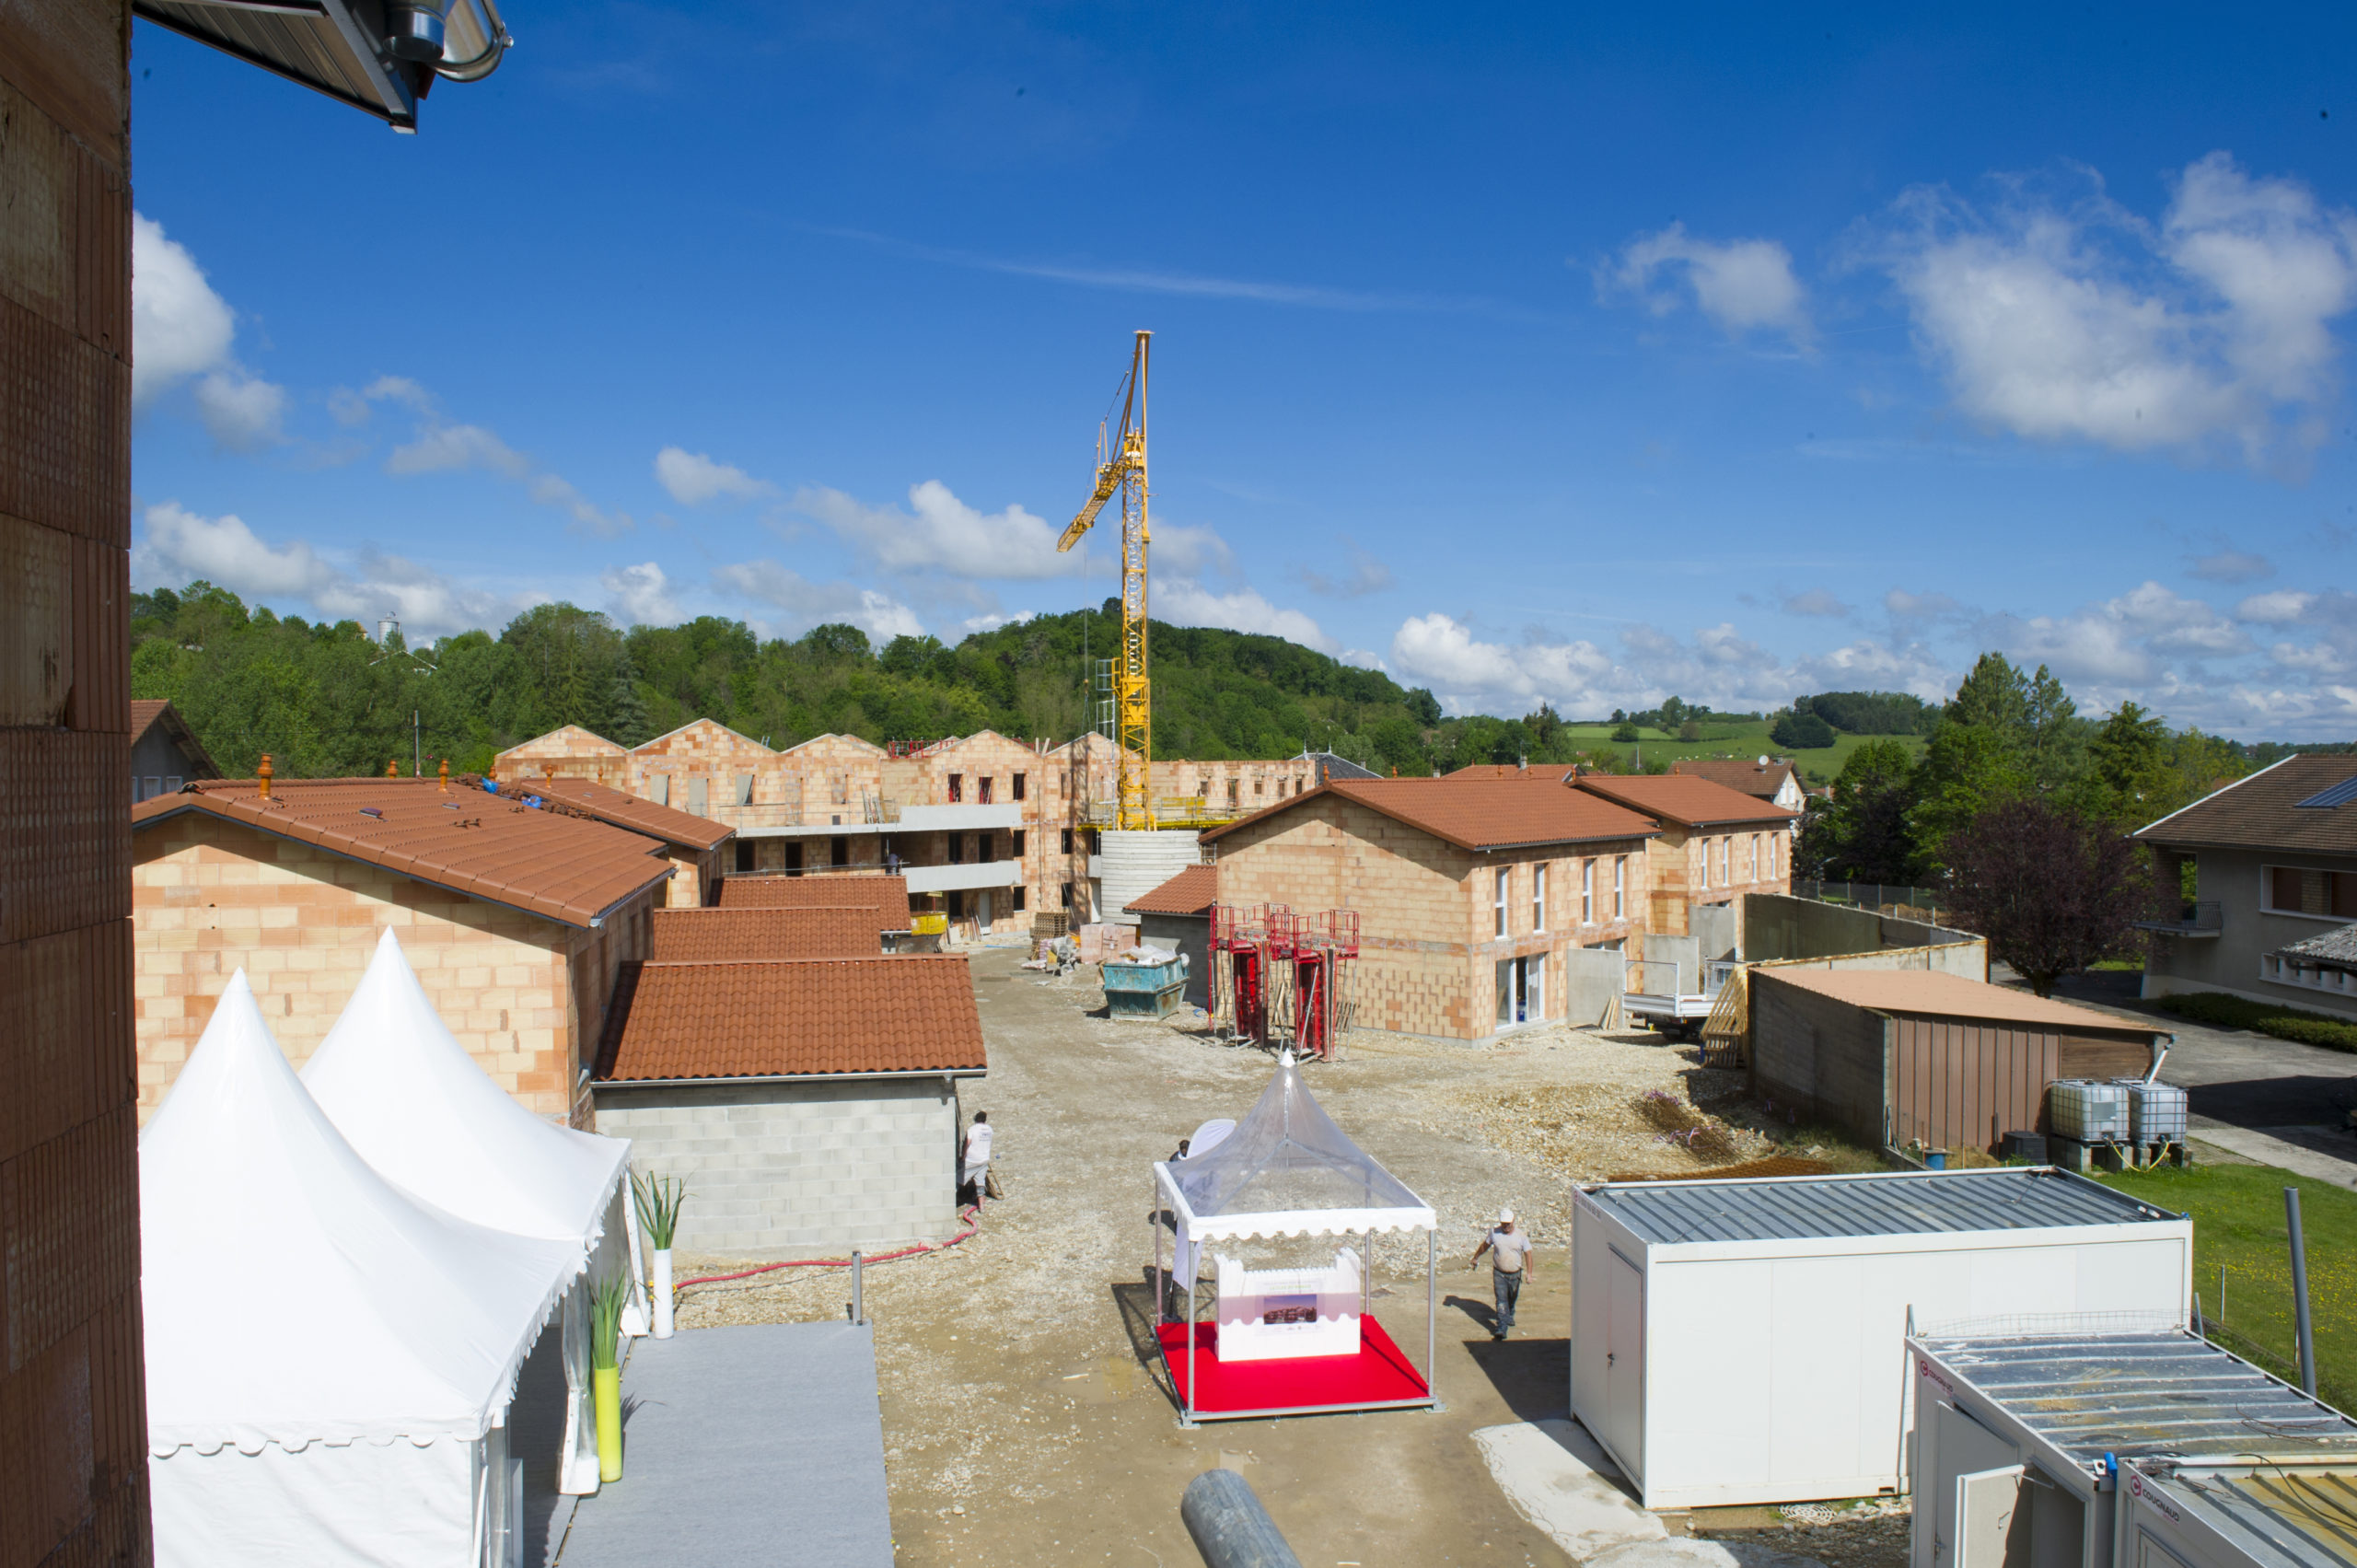 Alila - Inauguration organisée par Comadequat